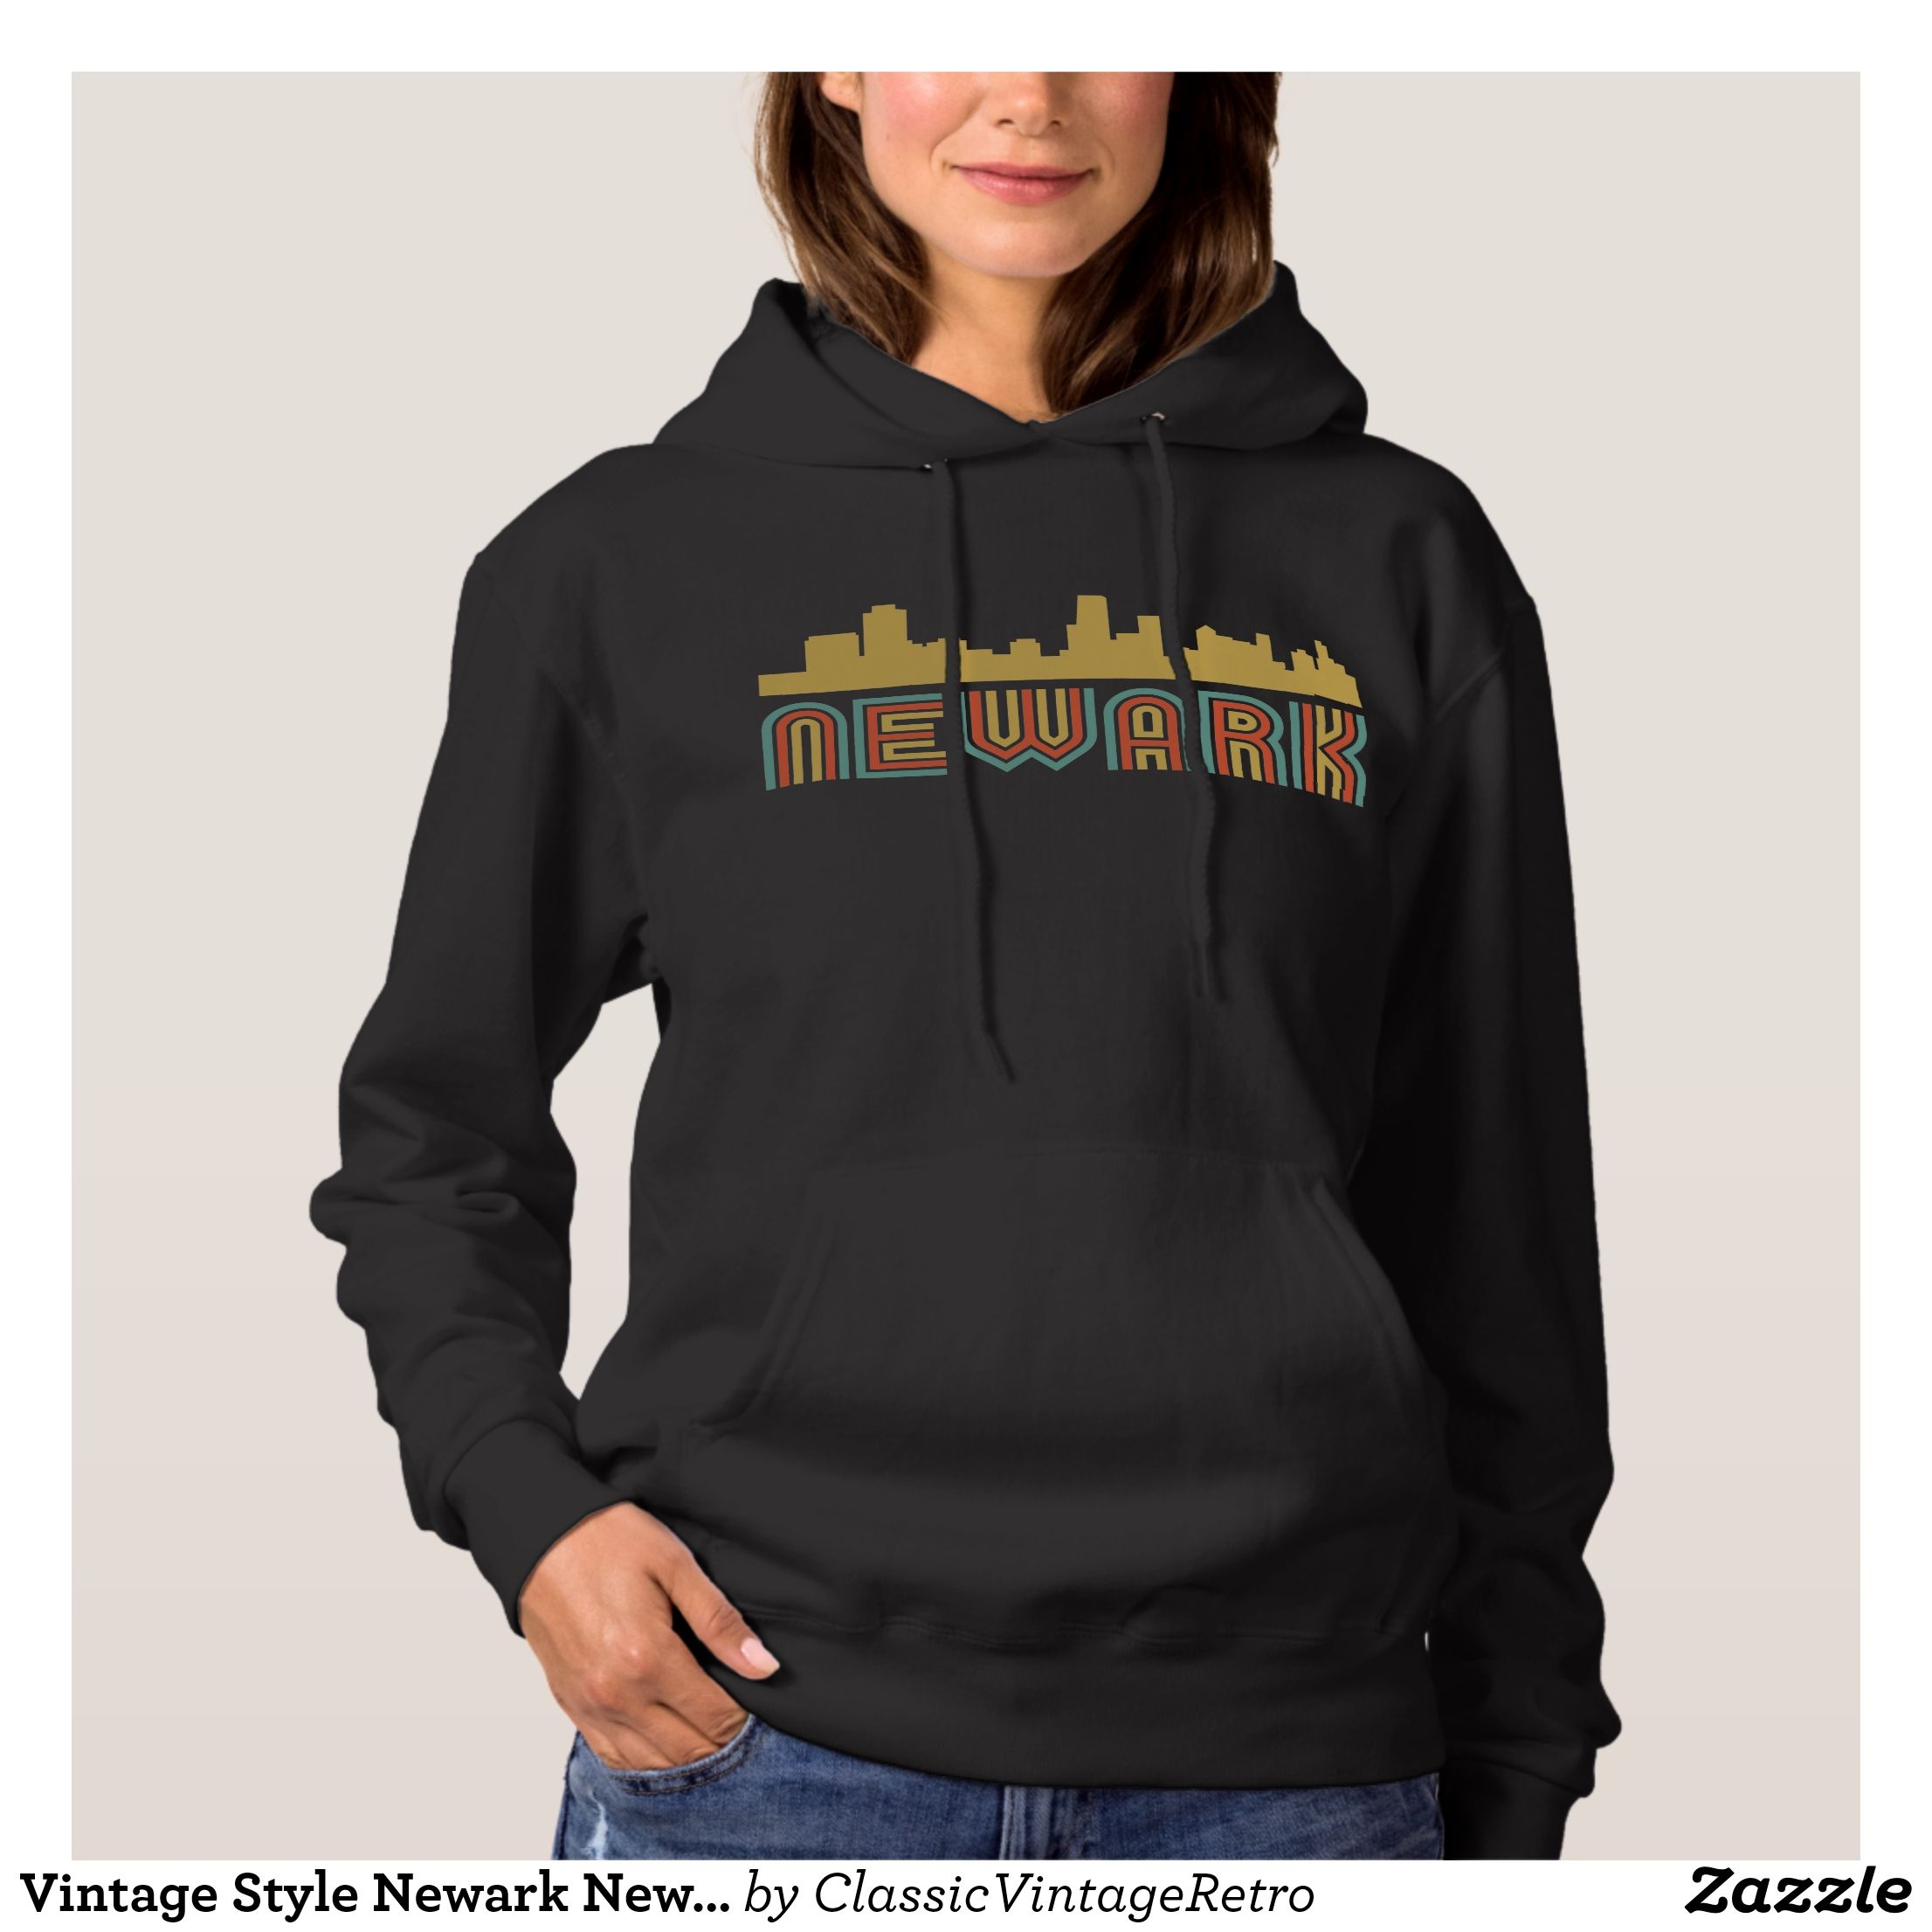 Vintage style newark new jersey skyline hoodie apparel clothing